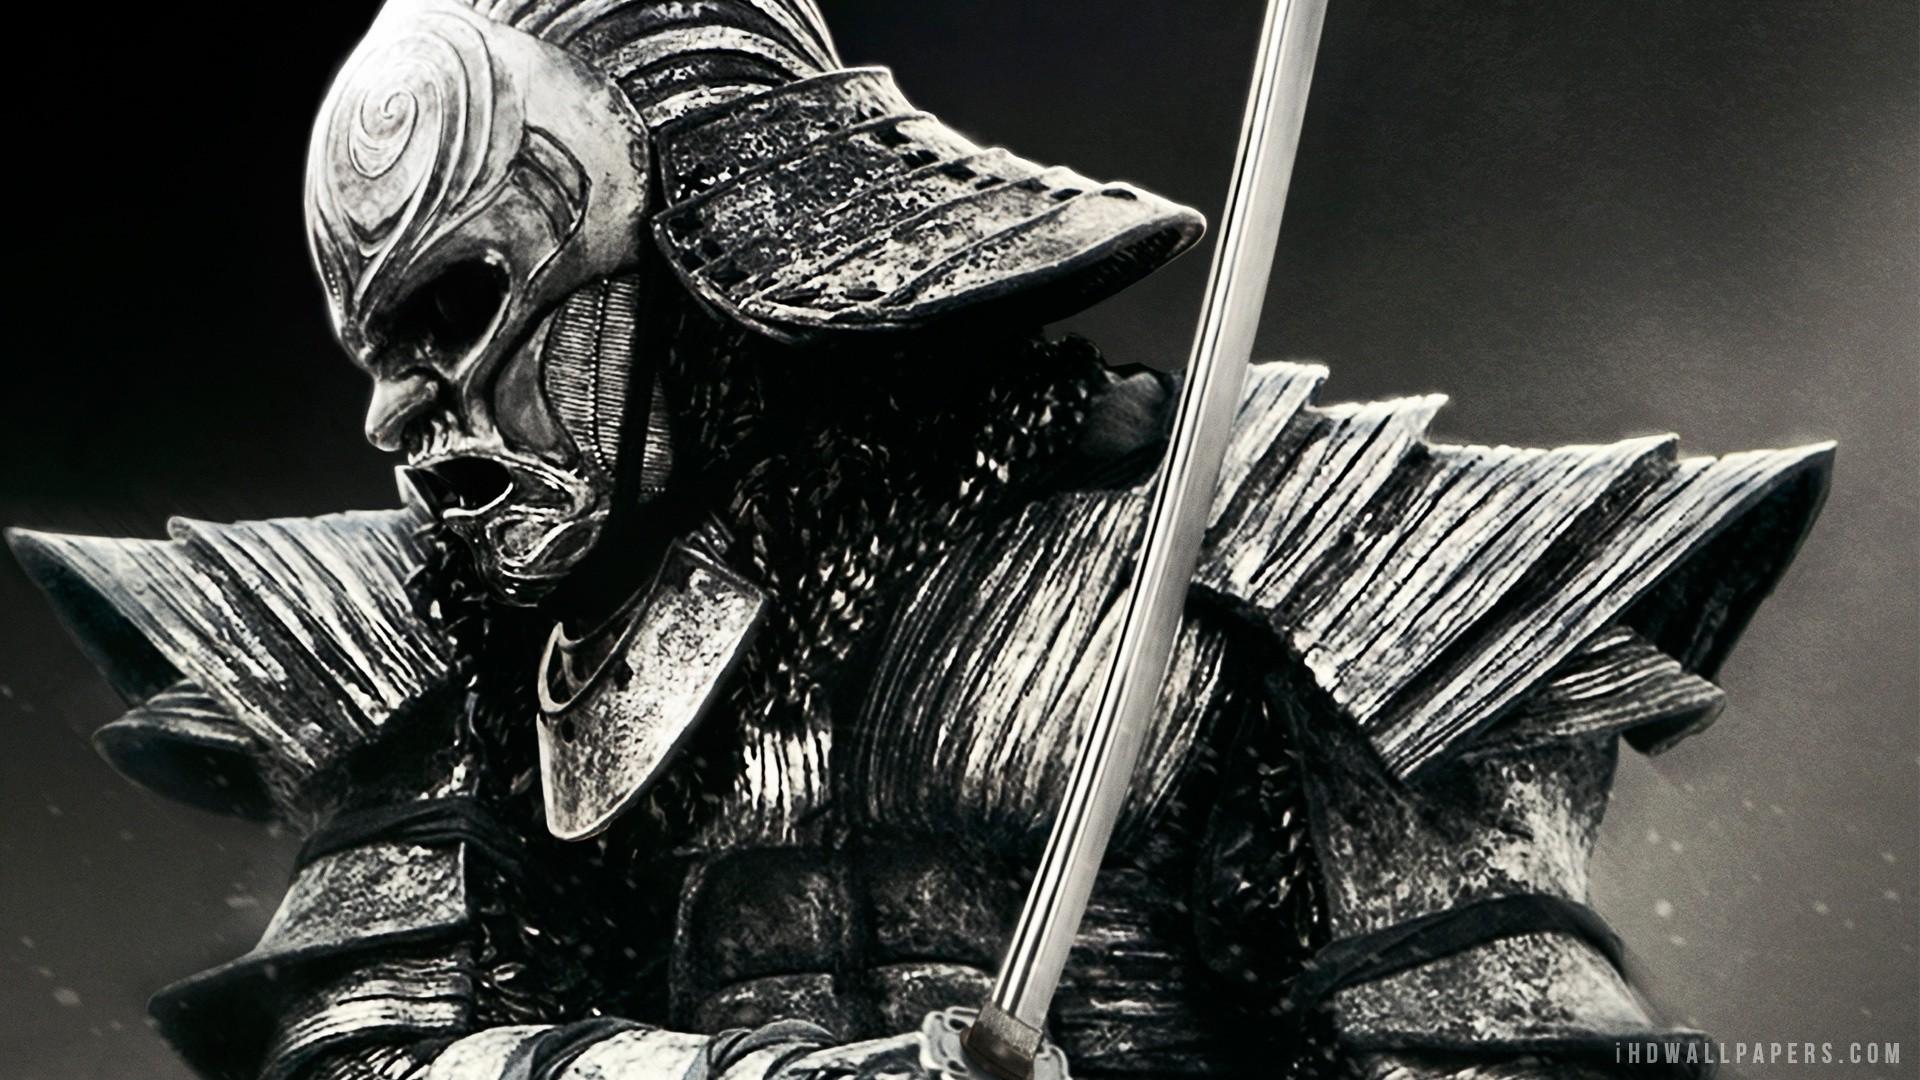 Res: 1920x1080, Samurai Warrior in 47 Ronin HD Wallpaper - iHD Wallpapers